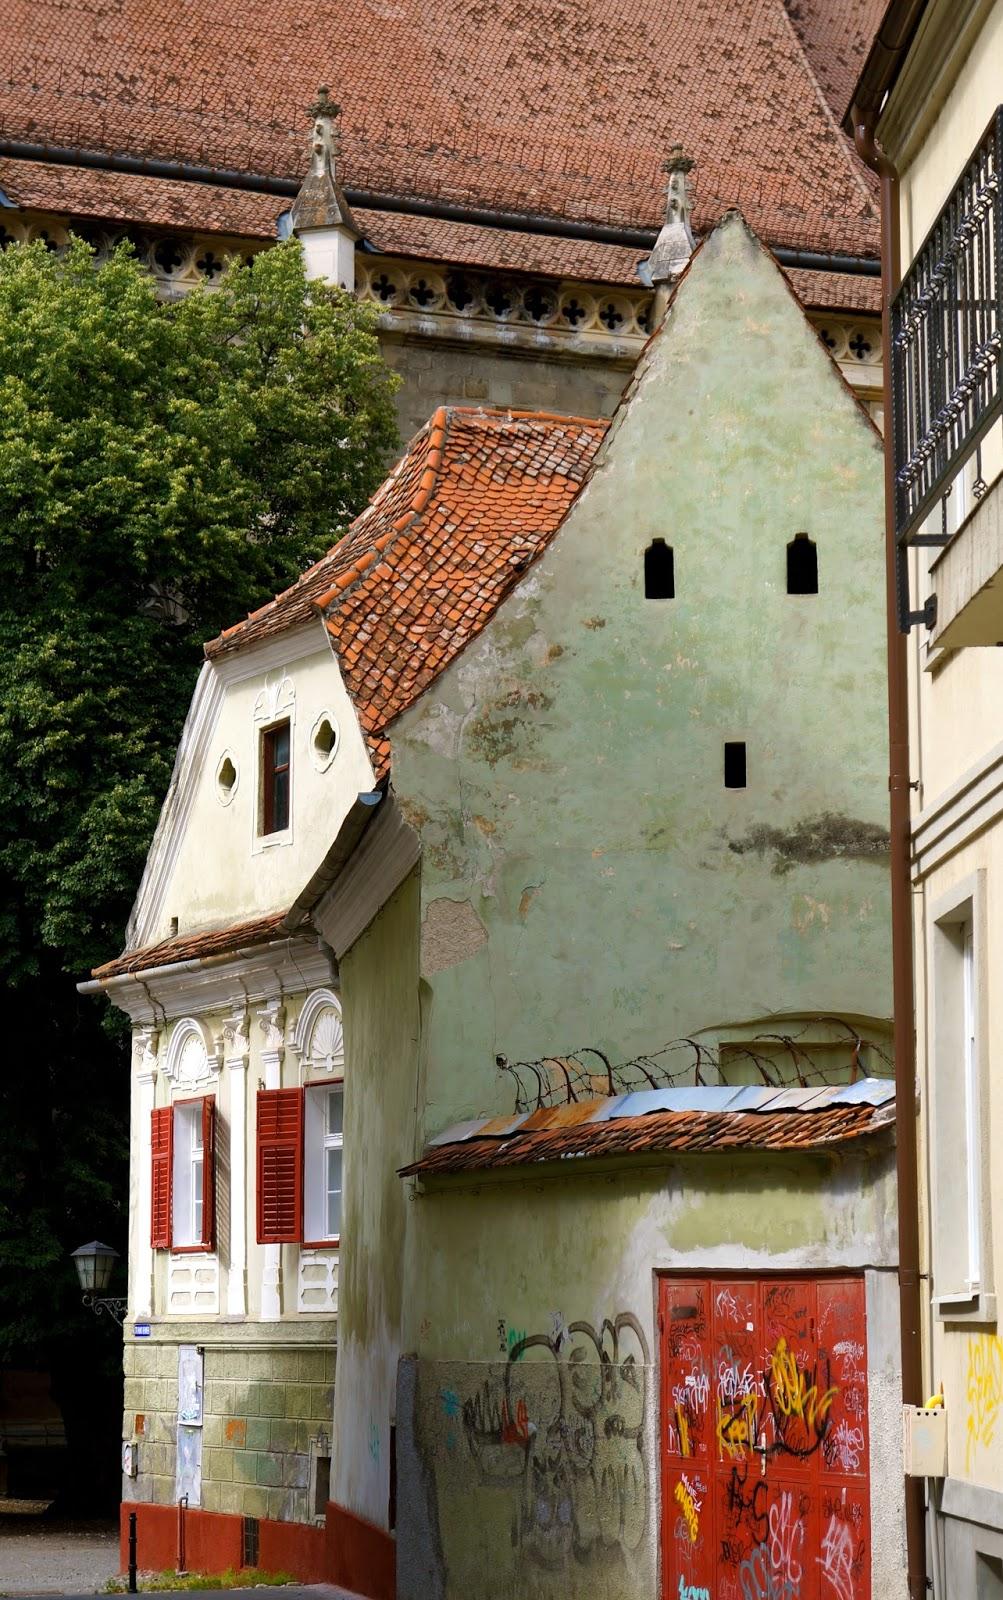 bella muzica restaurant,brasov,carpathian mountains, medieval town, old city hall,romania,sinai a,the black church,transylvania